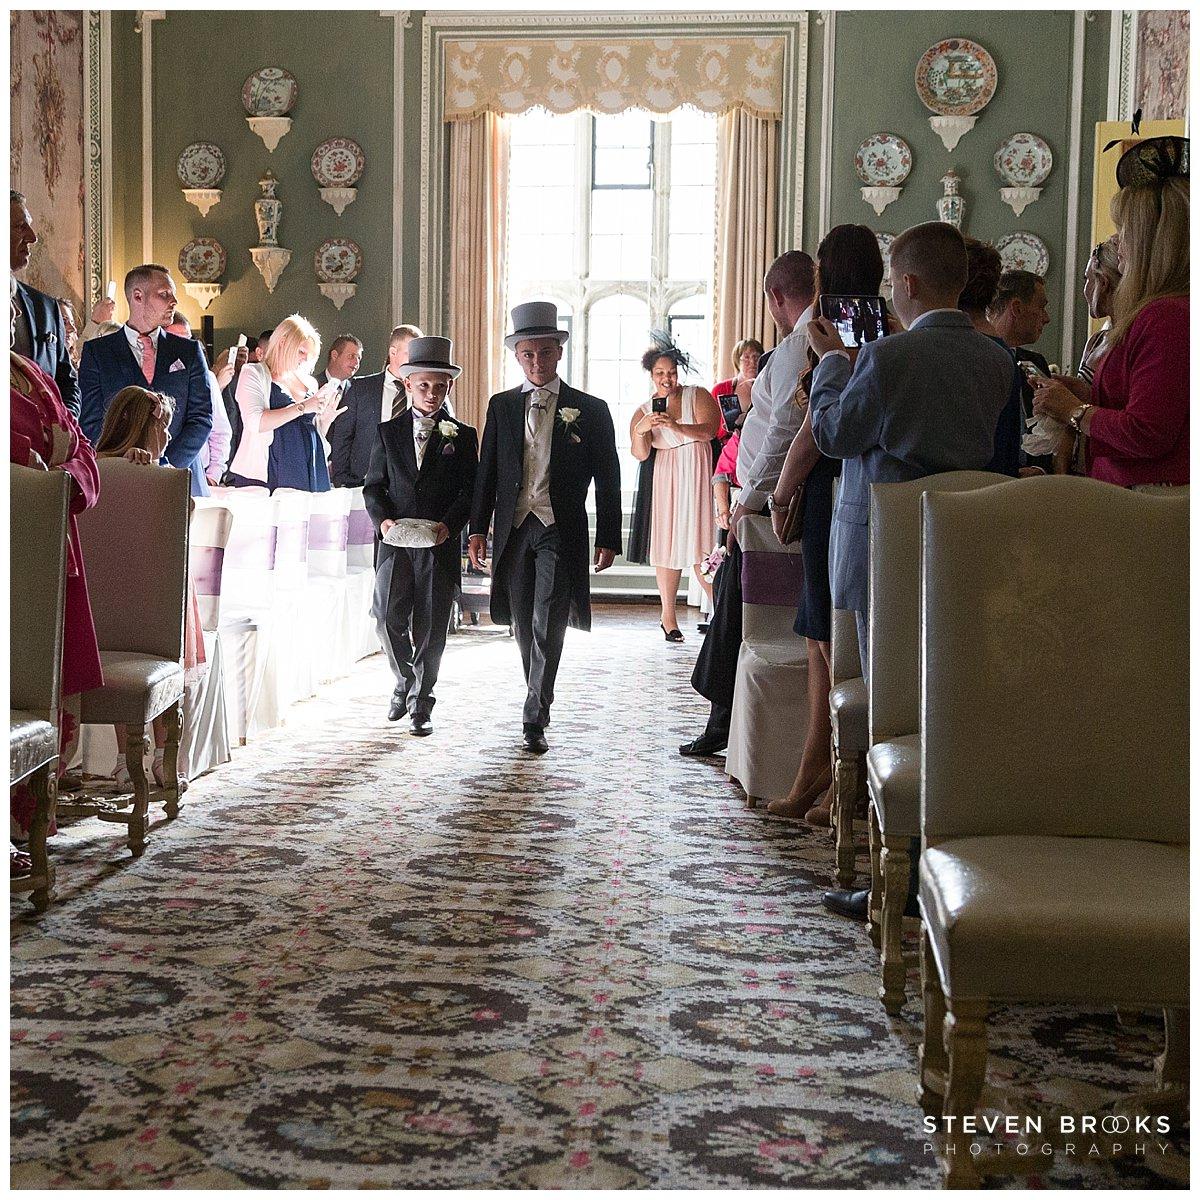 Leeds Castle wedding photographer steven brooks photographs bridal party entering the wedding cermony room